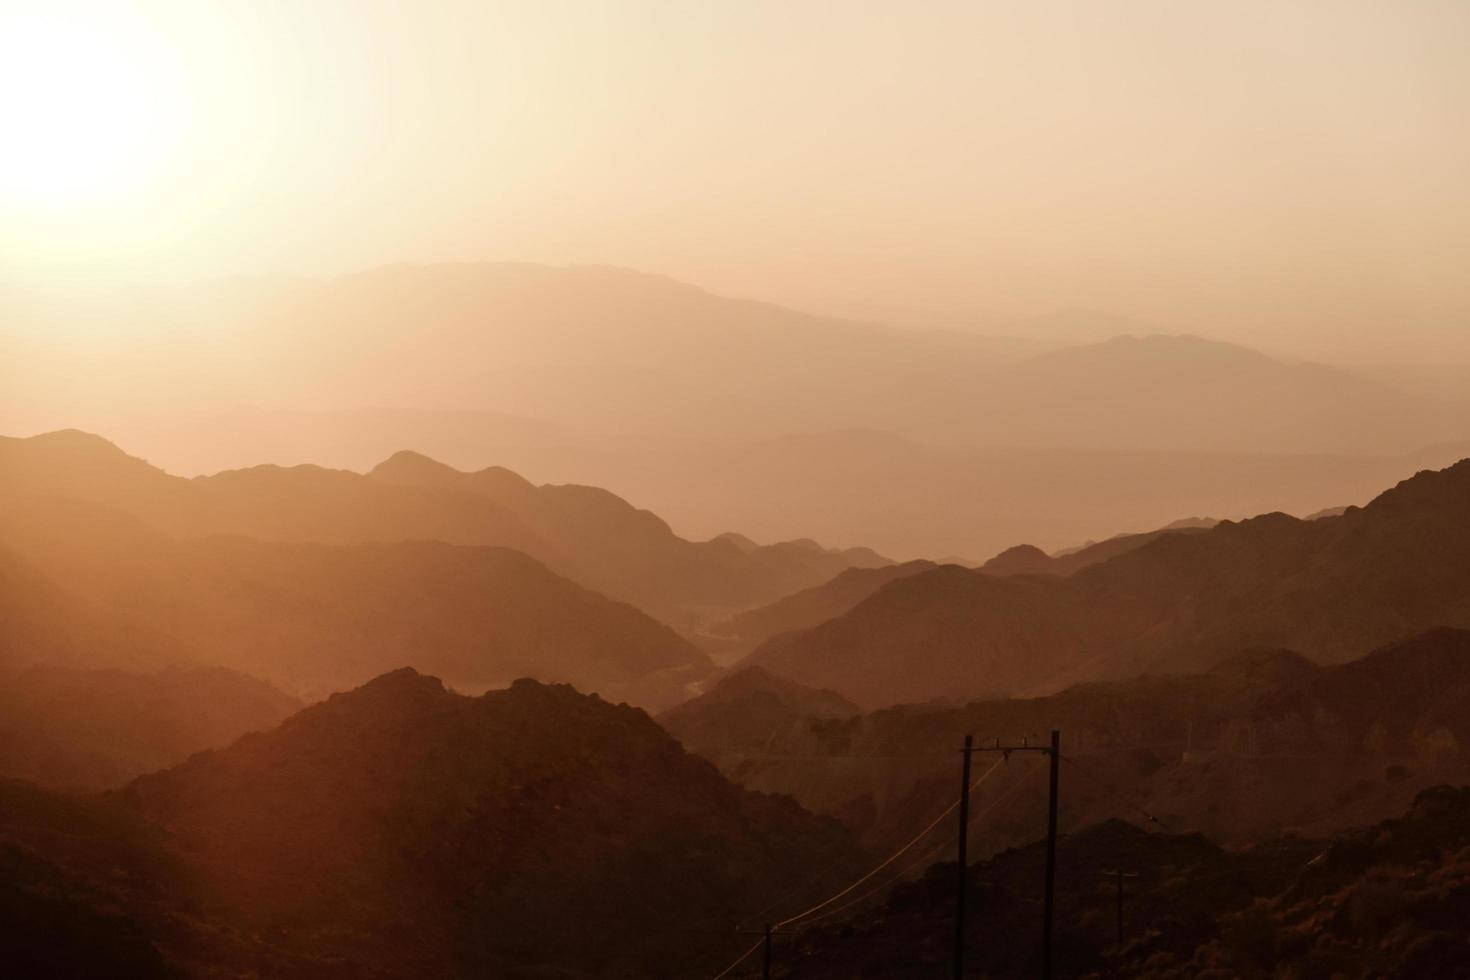 Sunset over layers of mountain range photo